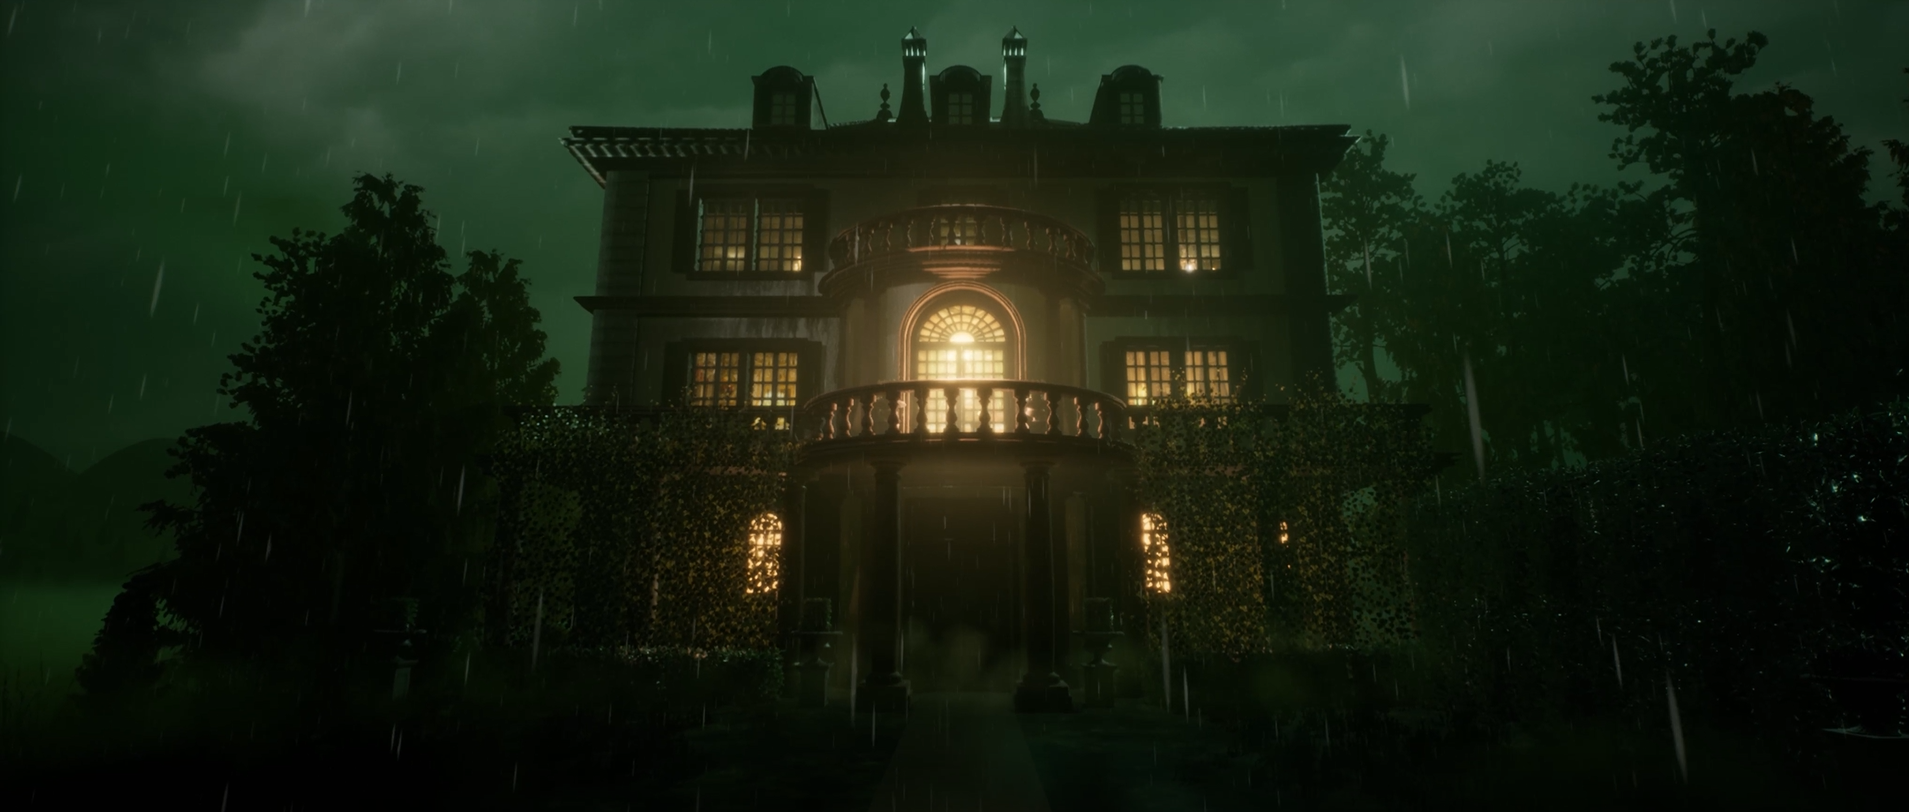 Screenshot of Exterior